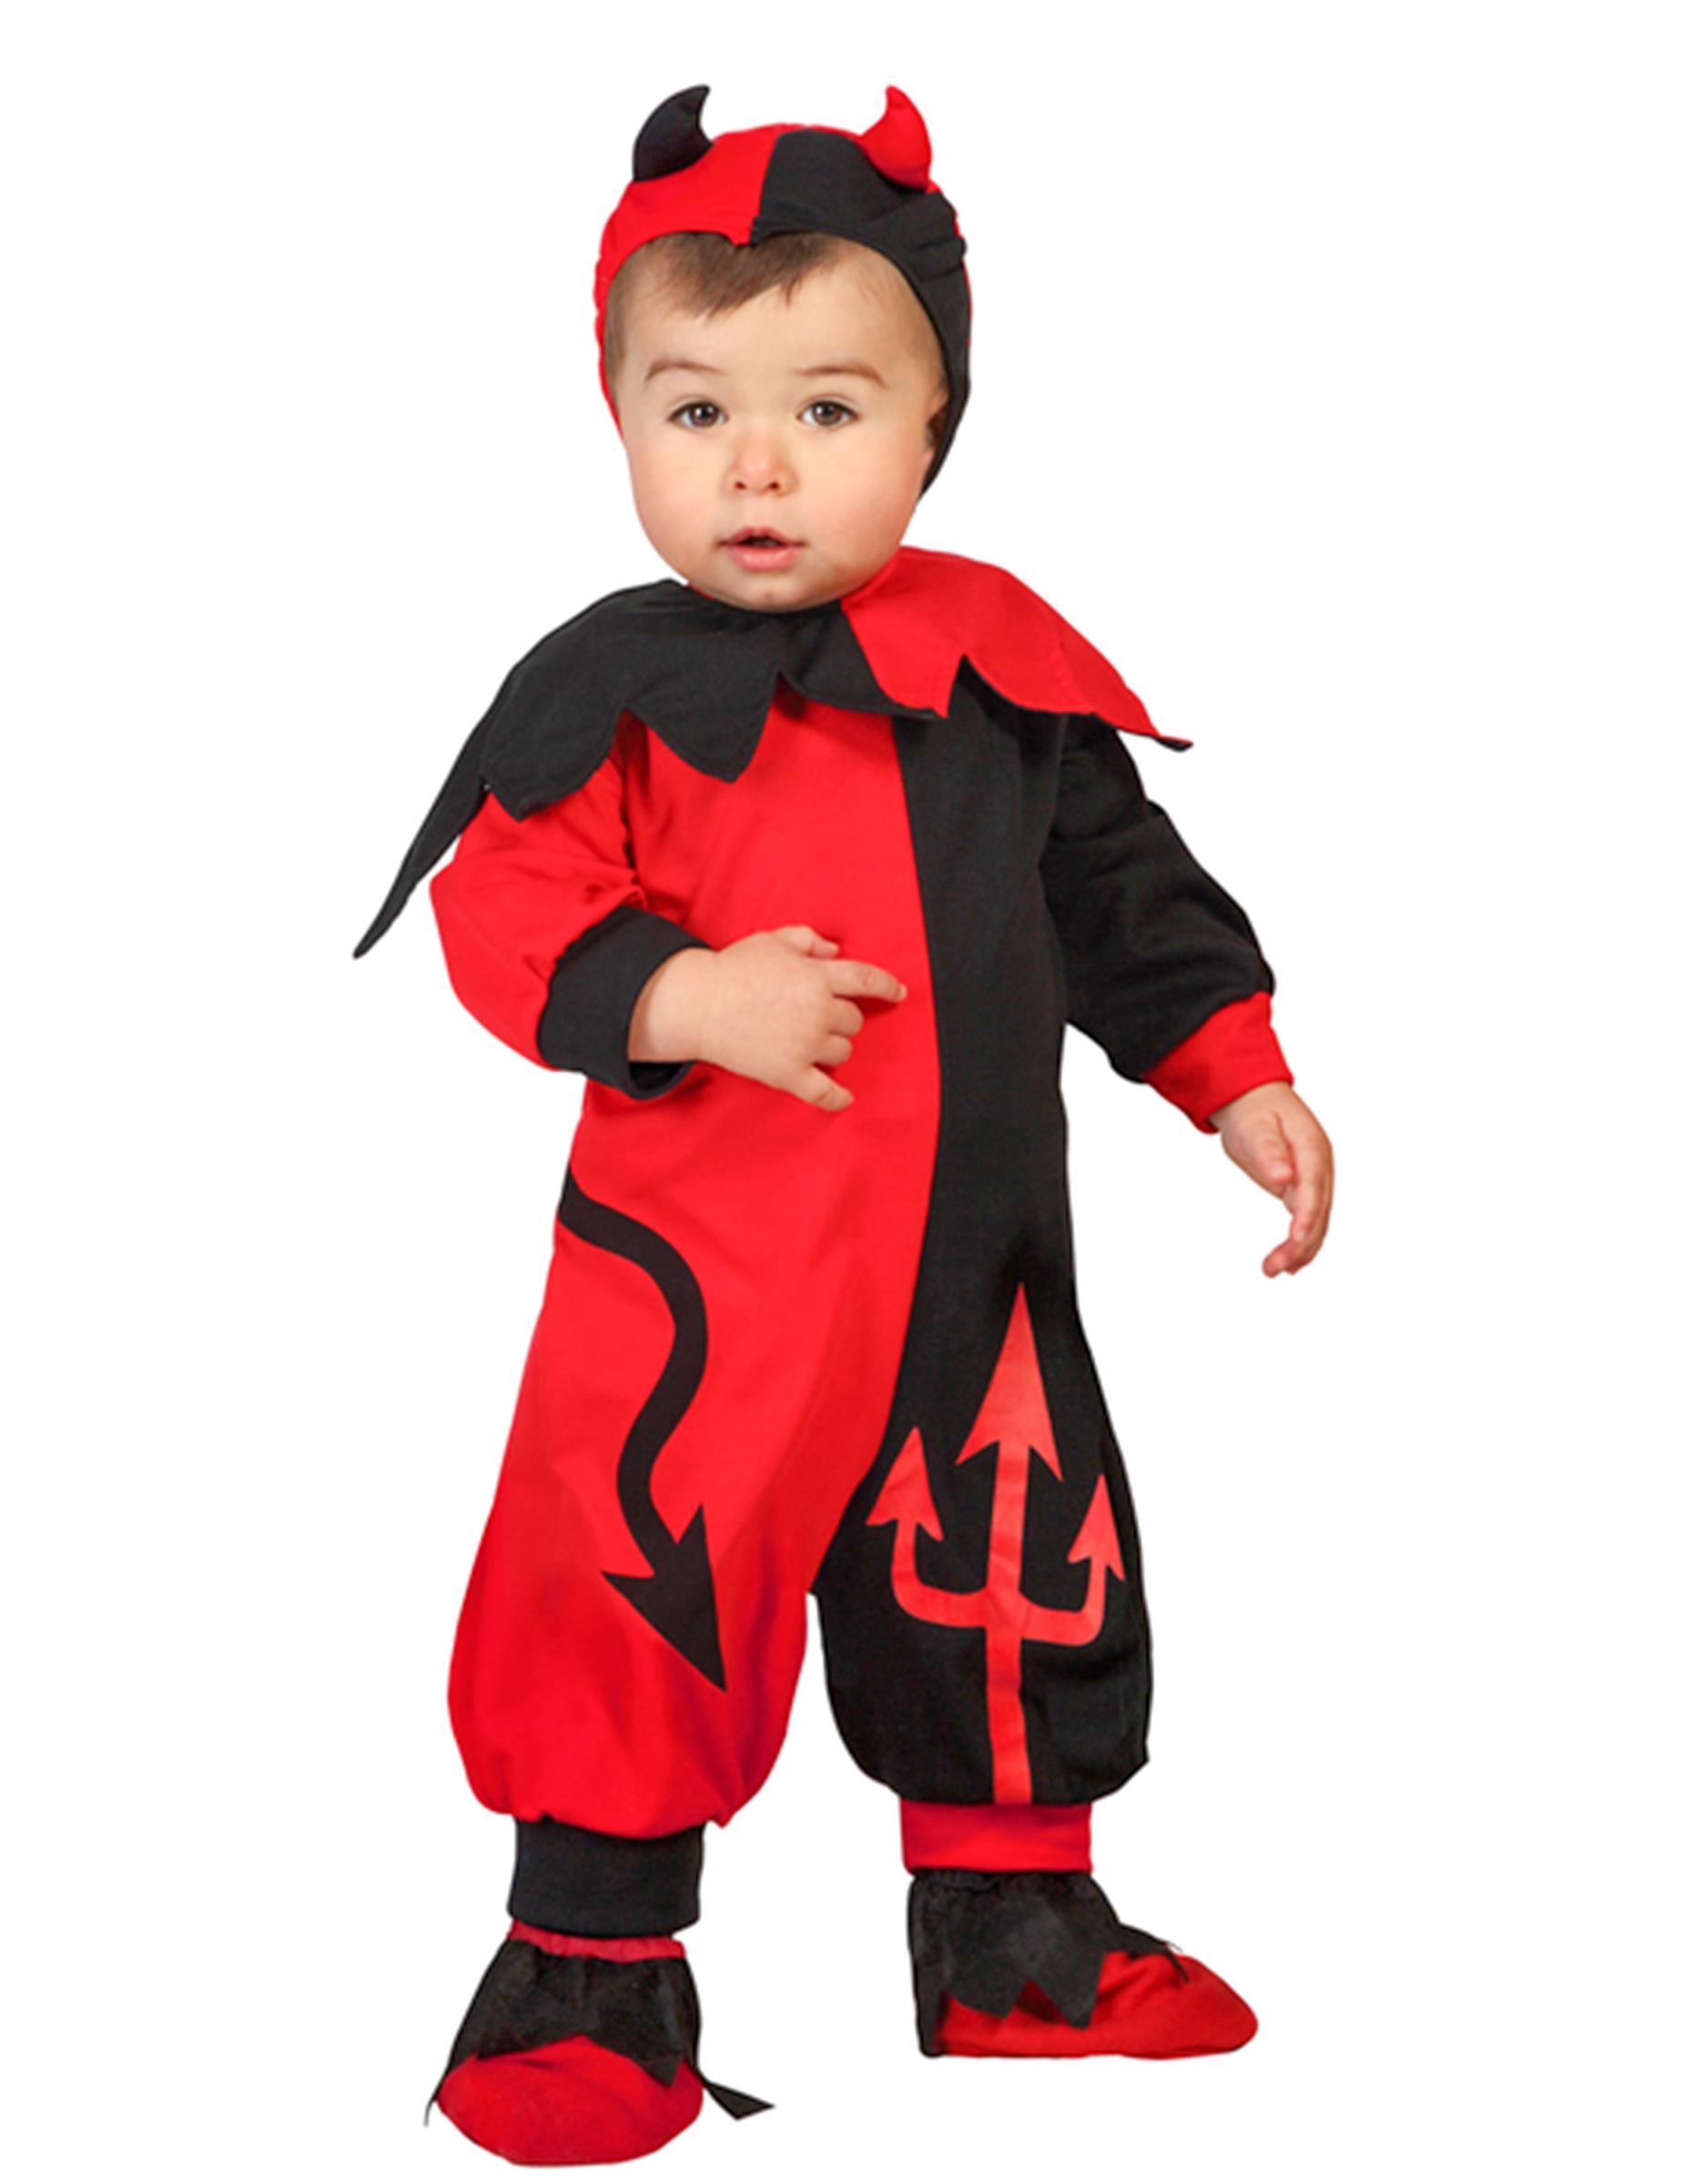 e82fb6573 Disfarce bébé diabo menino Halloween  Disfarces Crianças